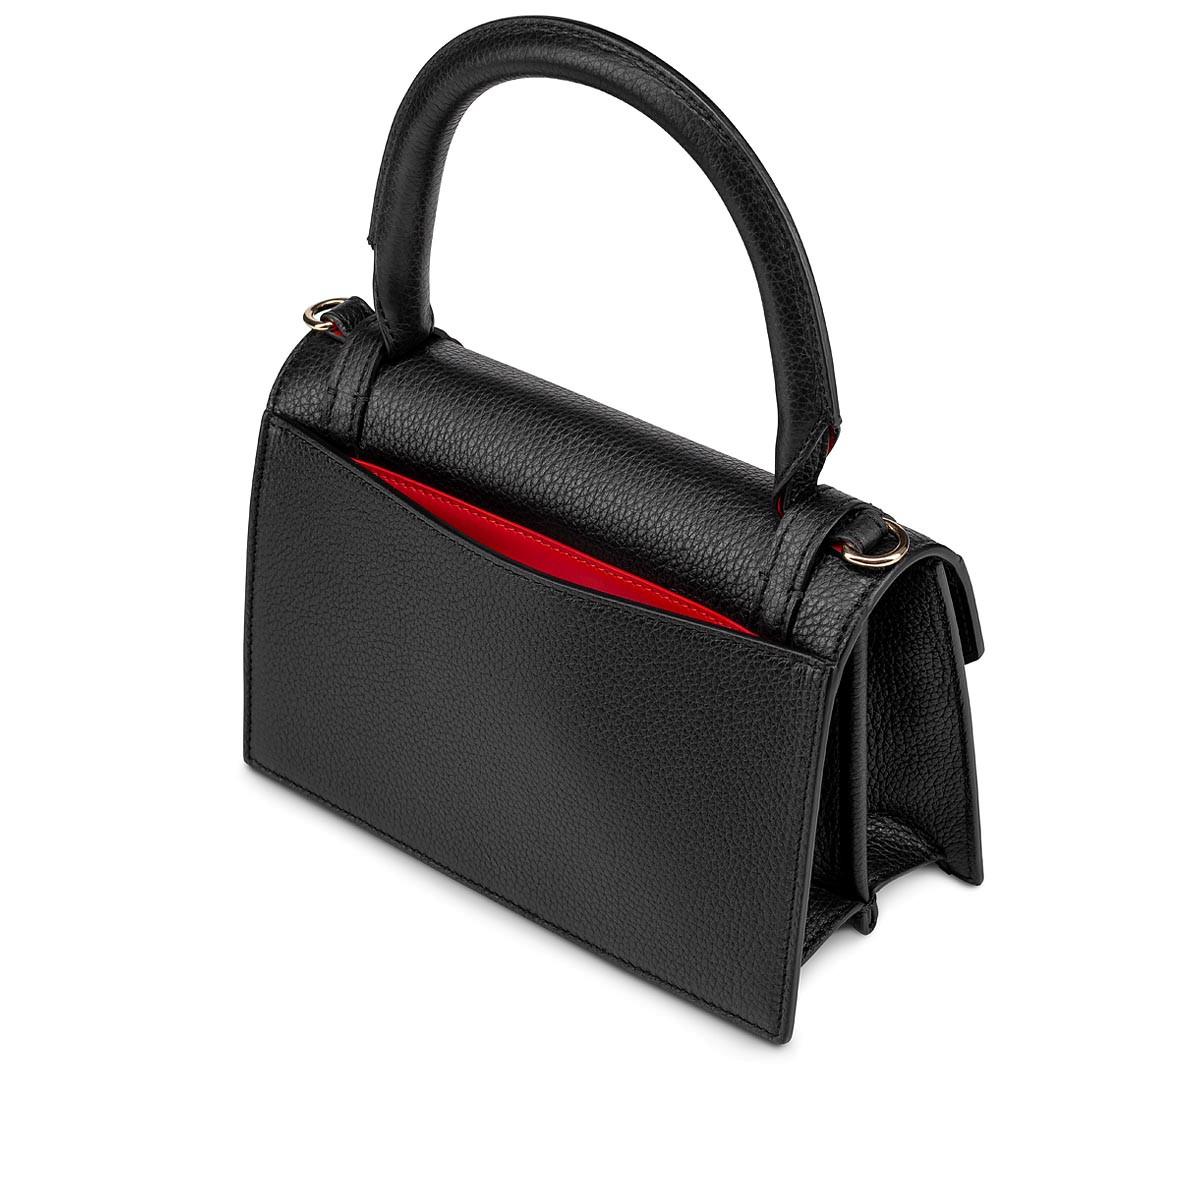 Bags - Elisa Porté Main Petit Modèle - Christian Louboutin